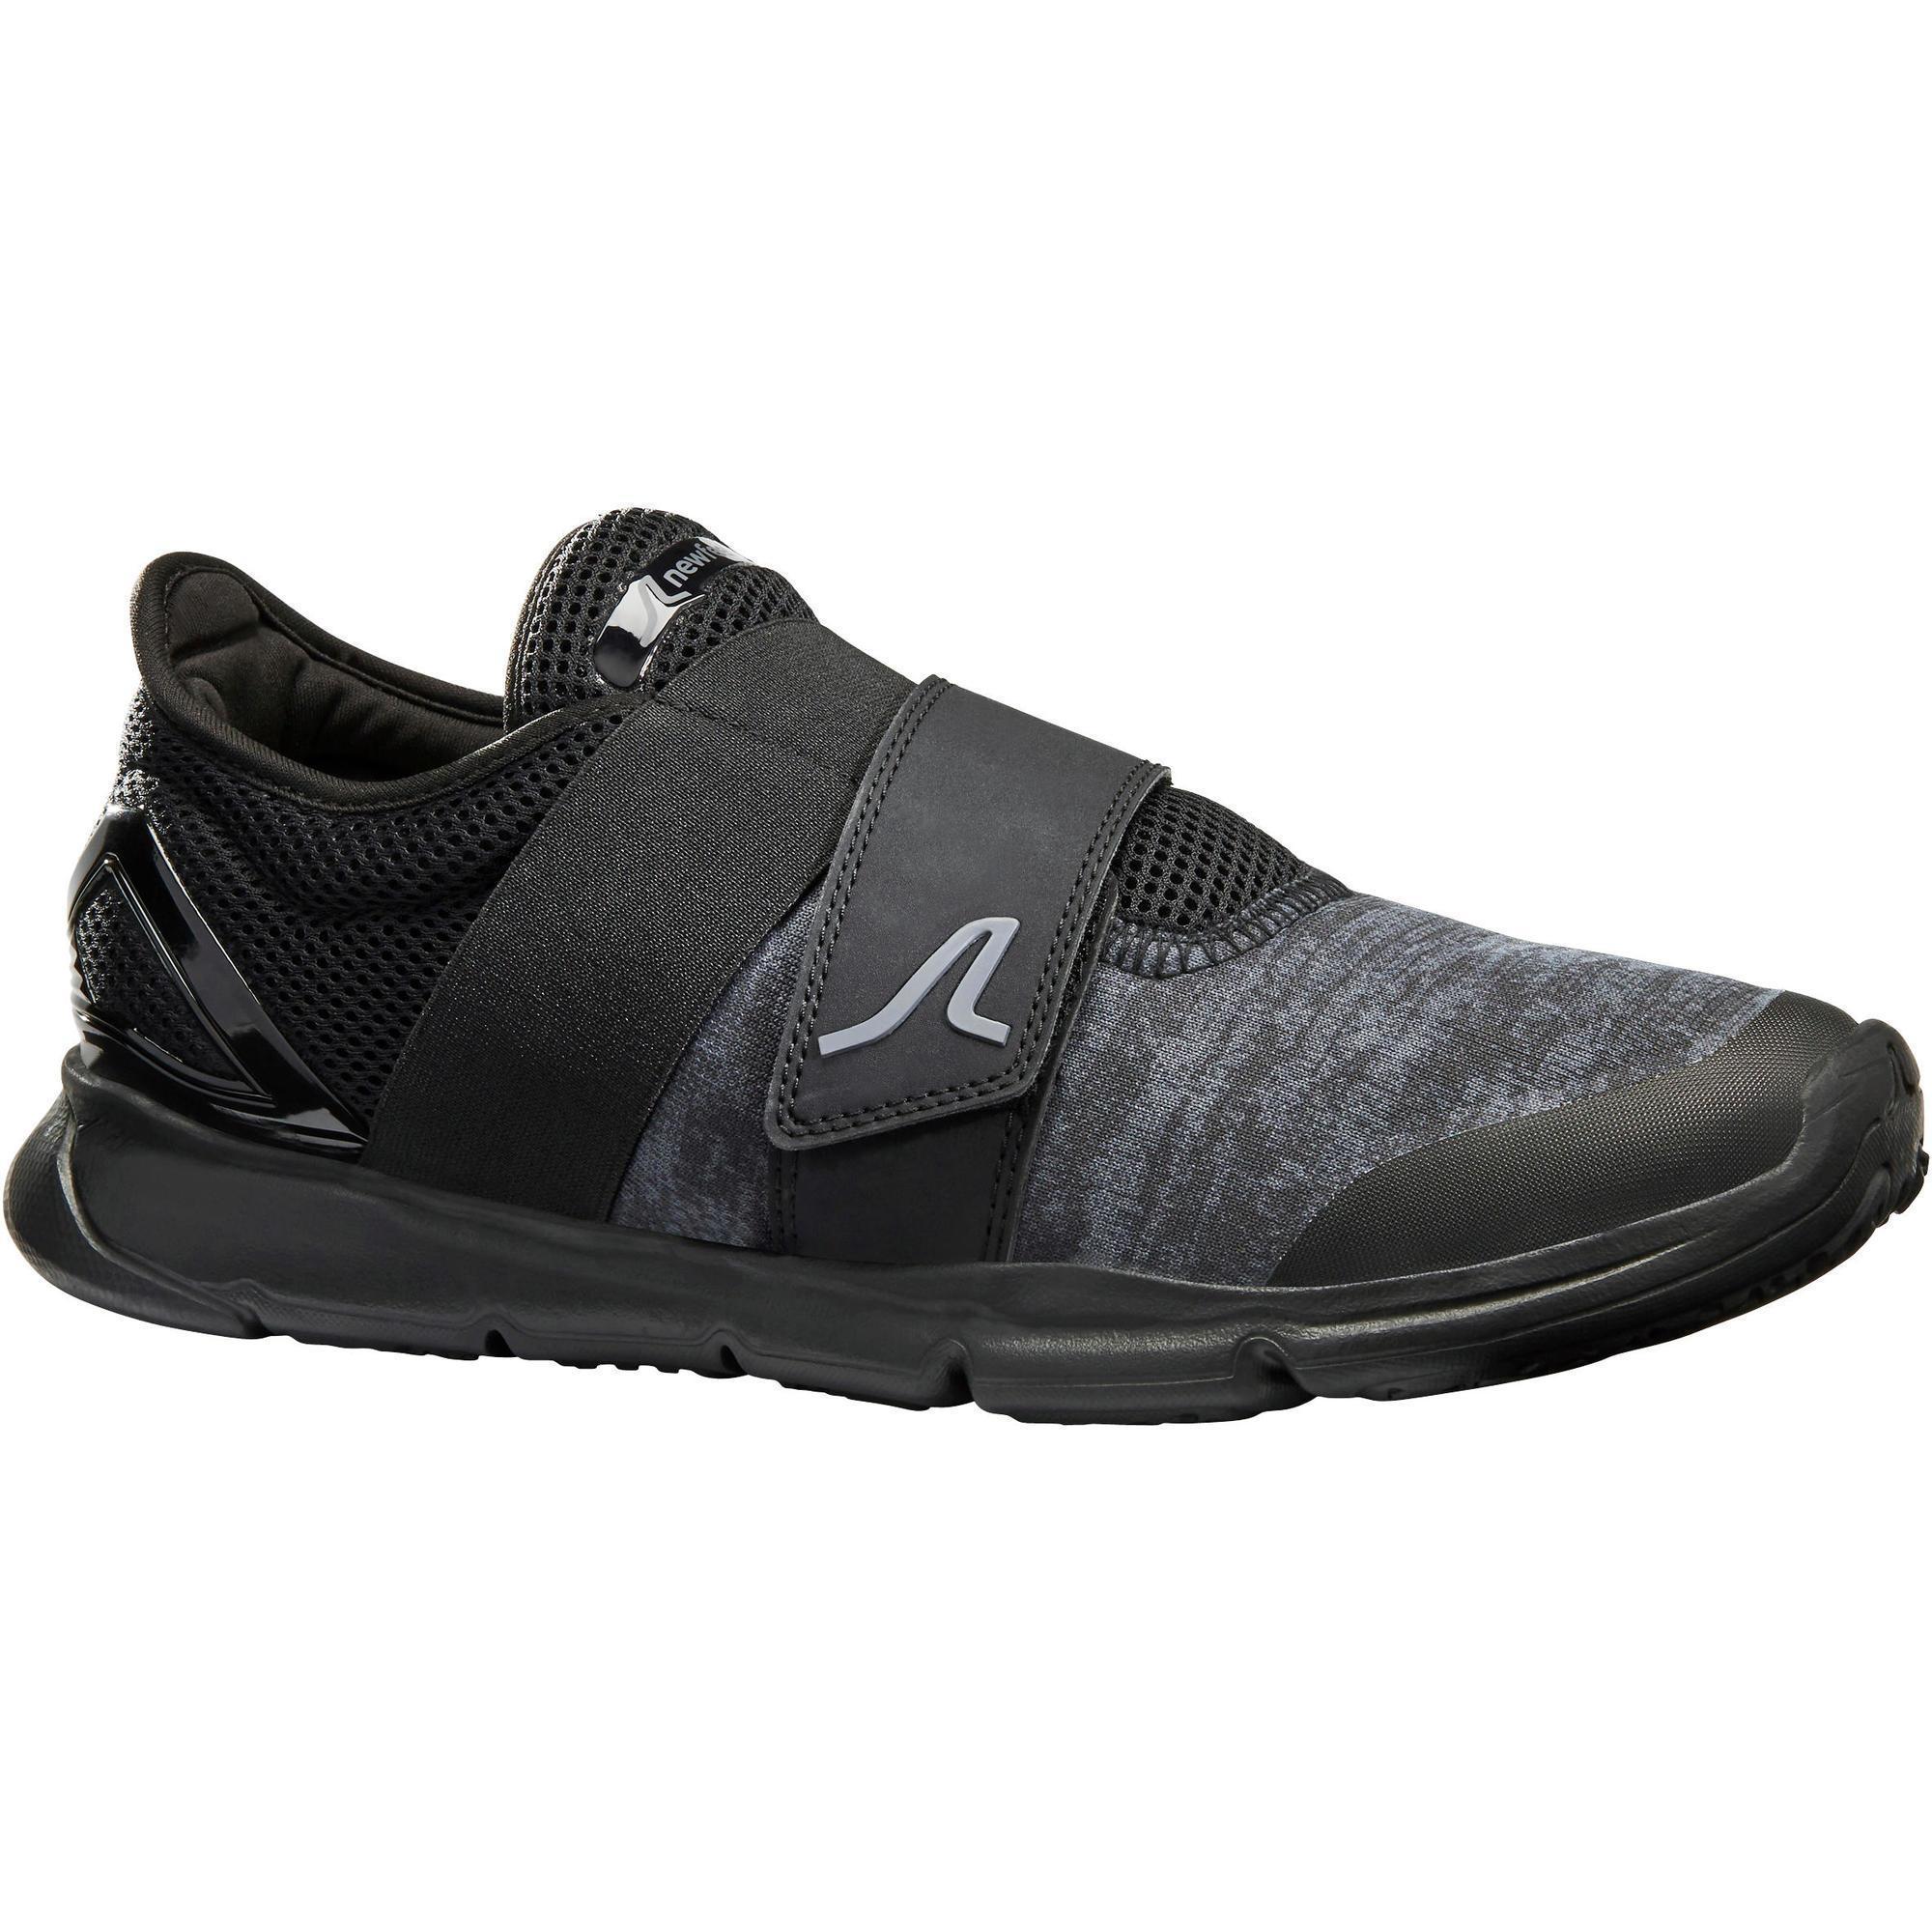 2766a3de Comprar Zapatillas de Caminar para Hombre Online | Decathlon